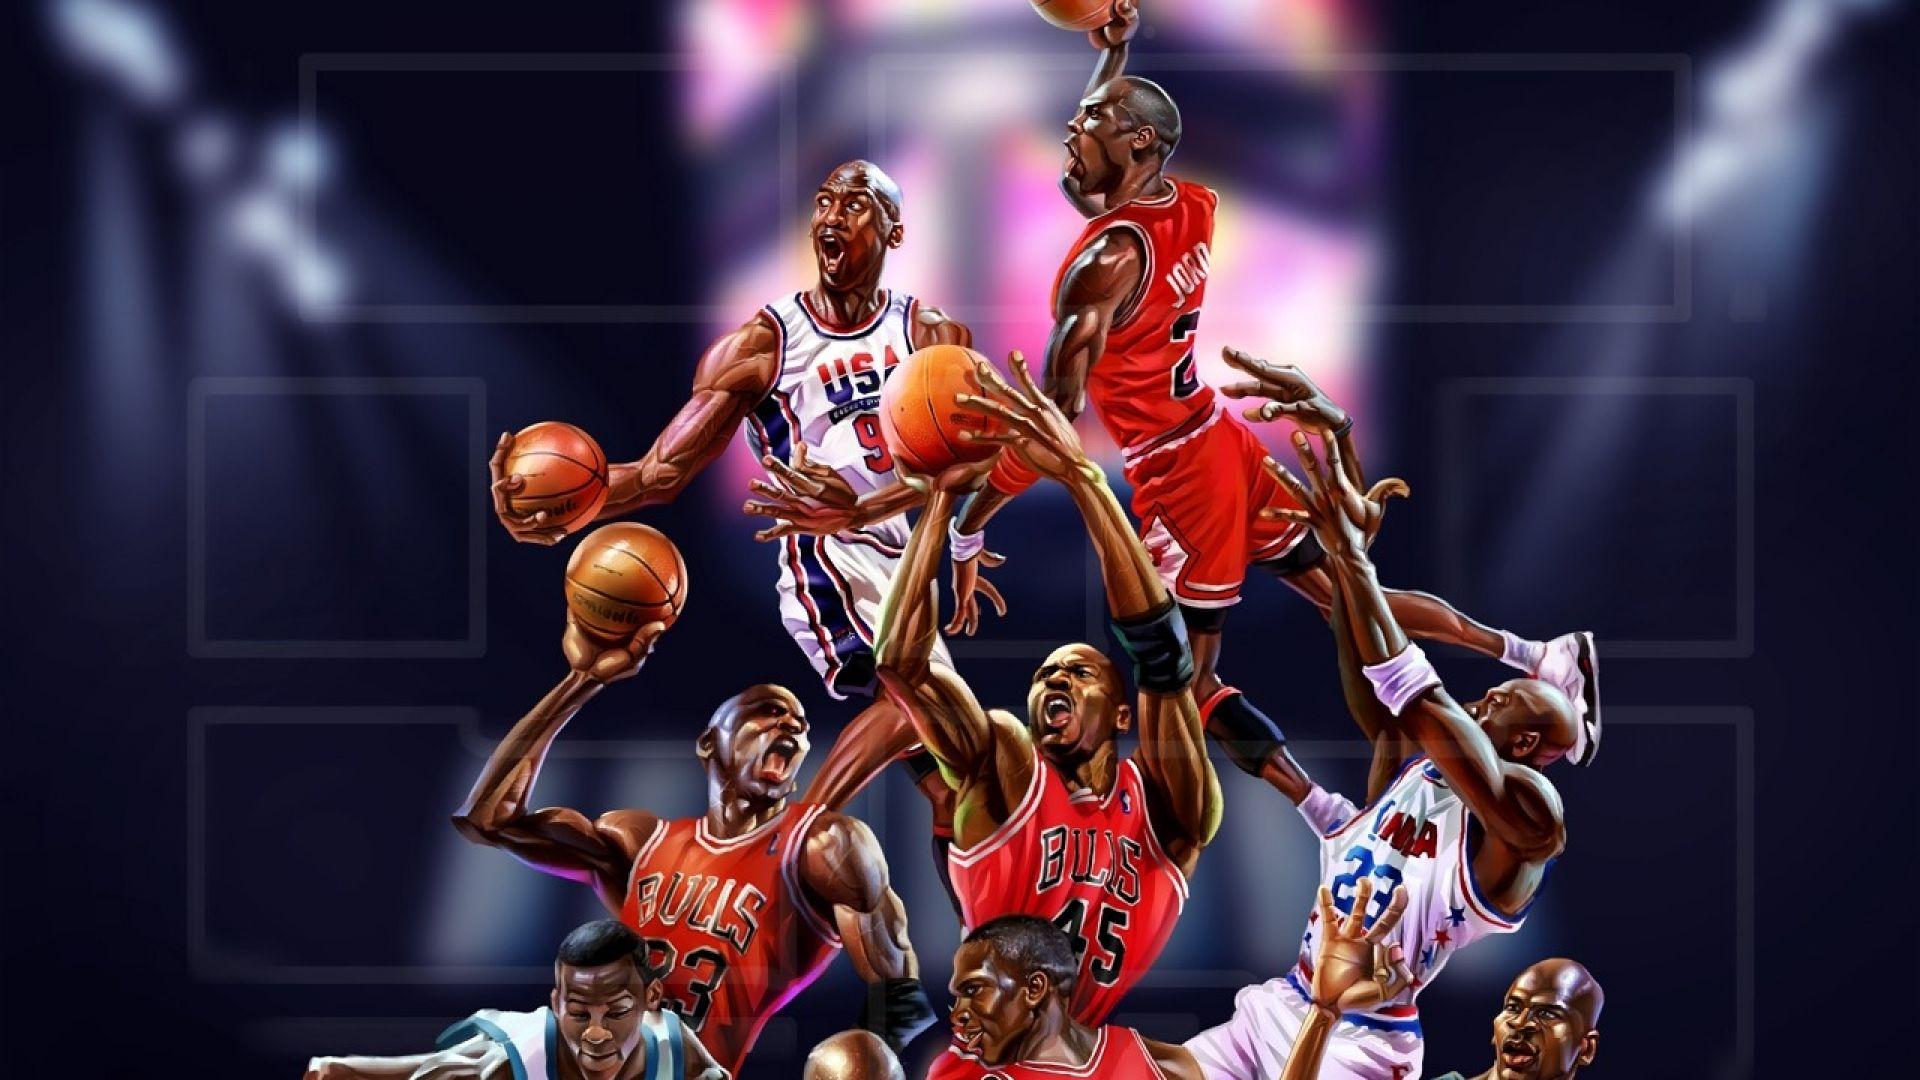 Wallpaper NBA, basketball, sports, players, art